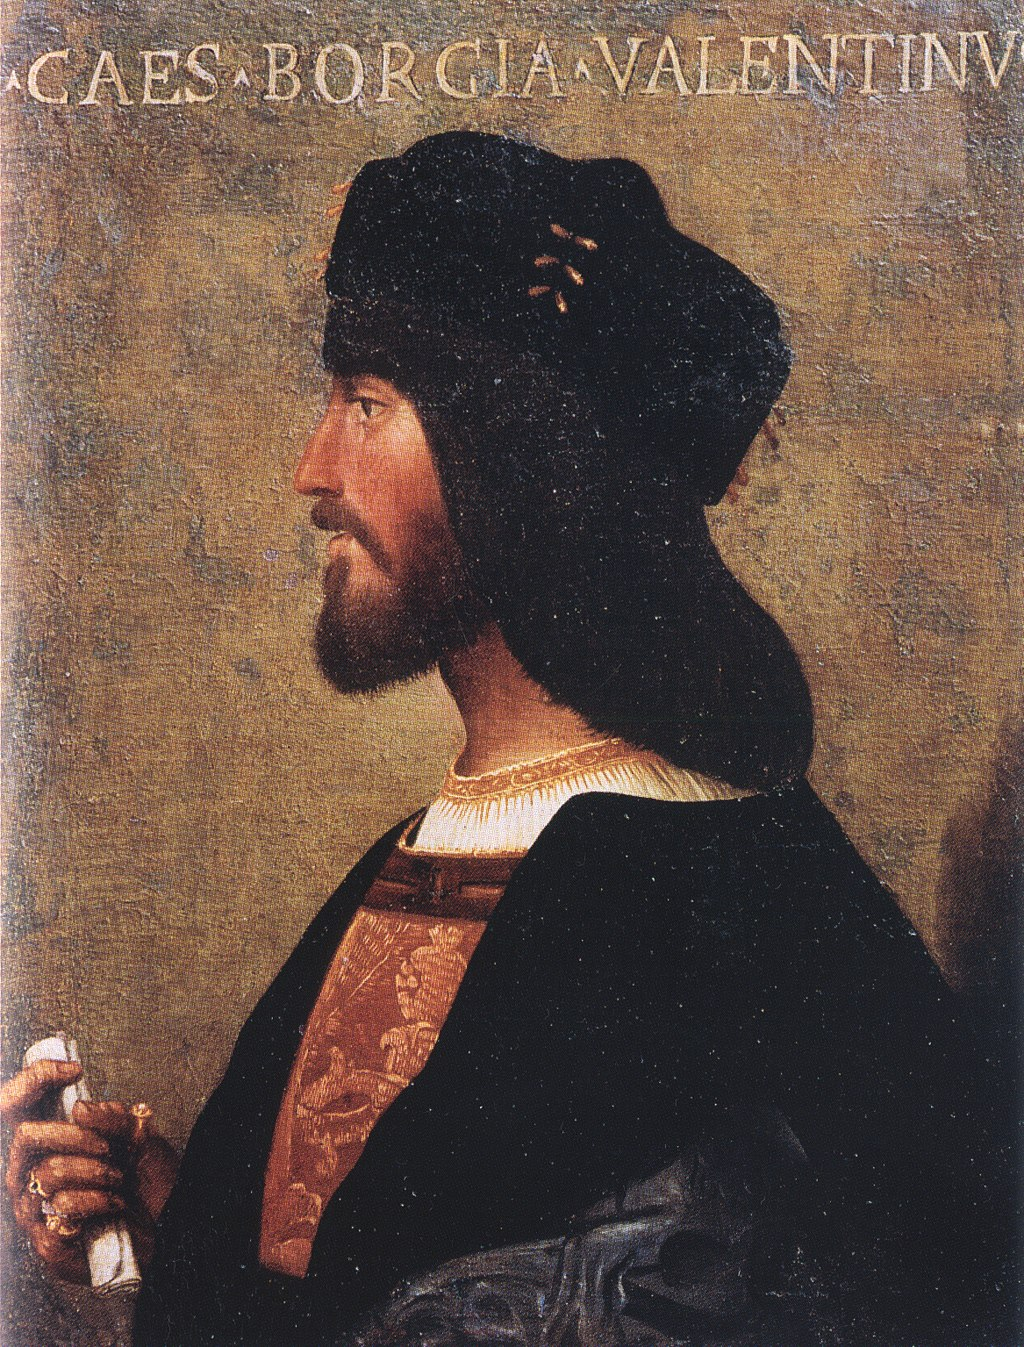 1024px-Cesare_Borgia,_Duke_of_Valentinois.jpg